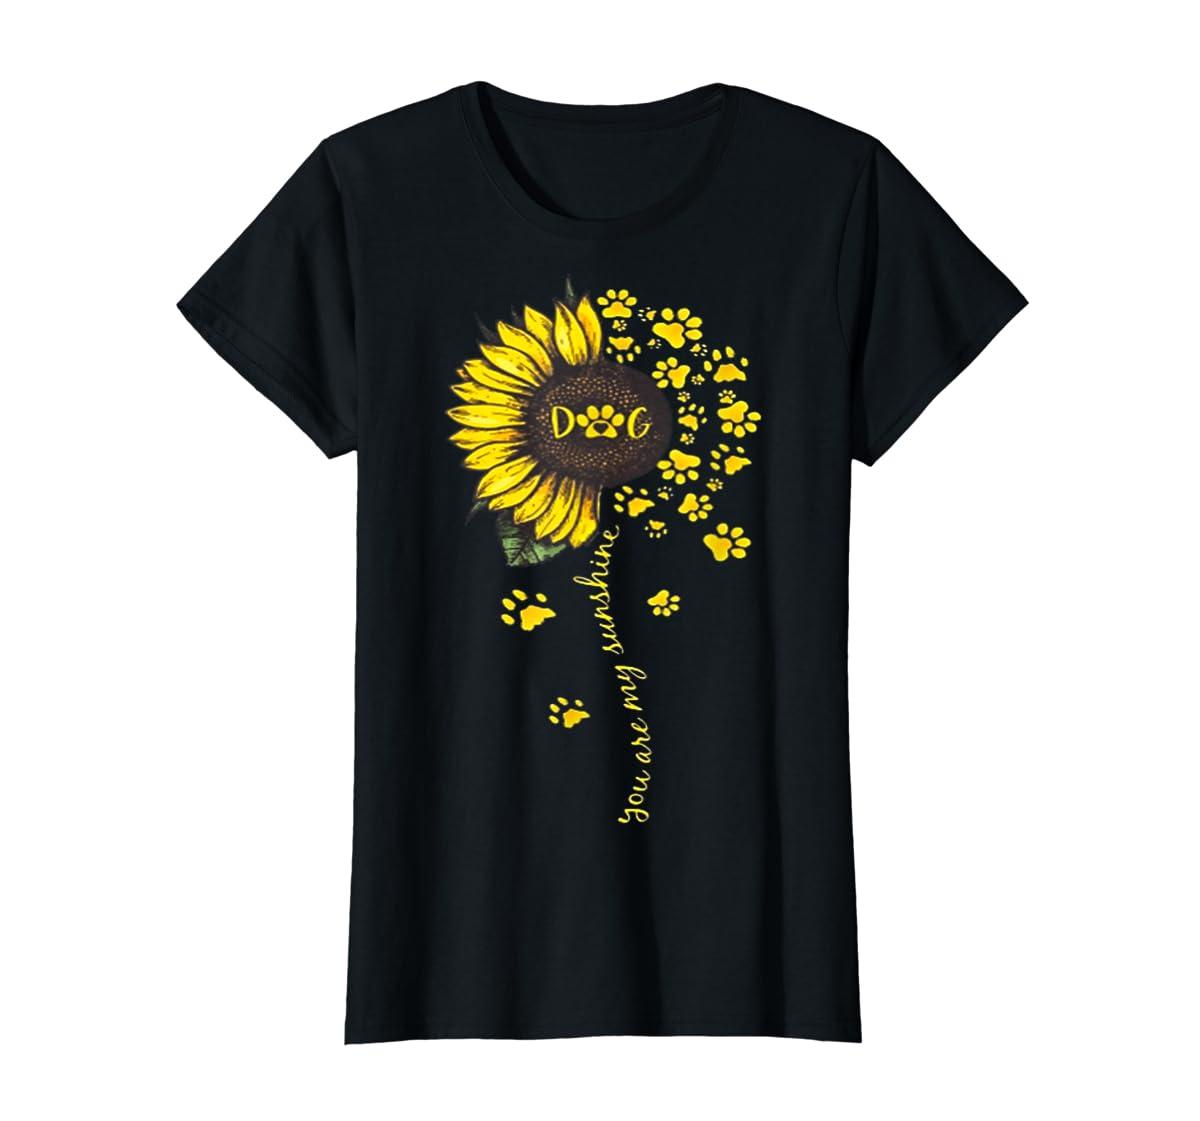 You Are My Sunshine Dog Tshirt-Women's T-Shirt-Black